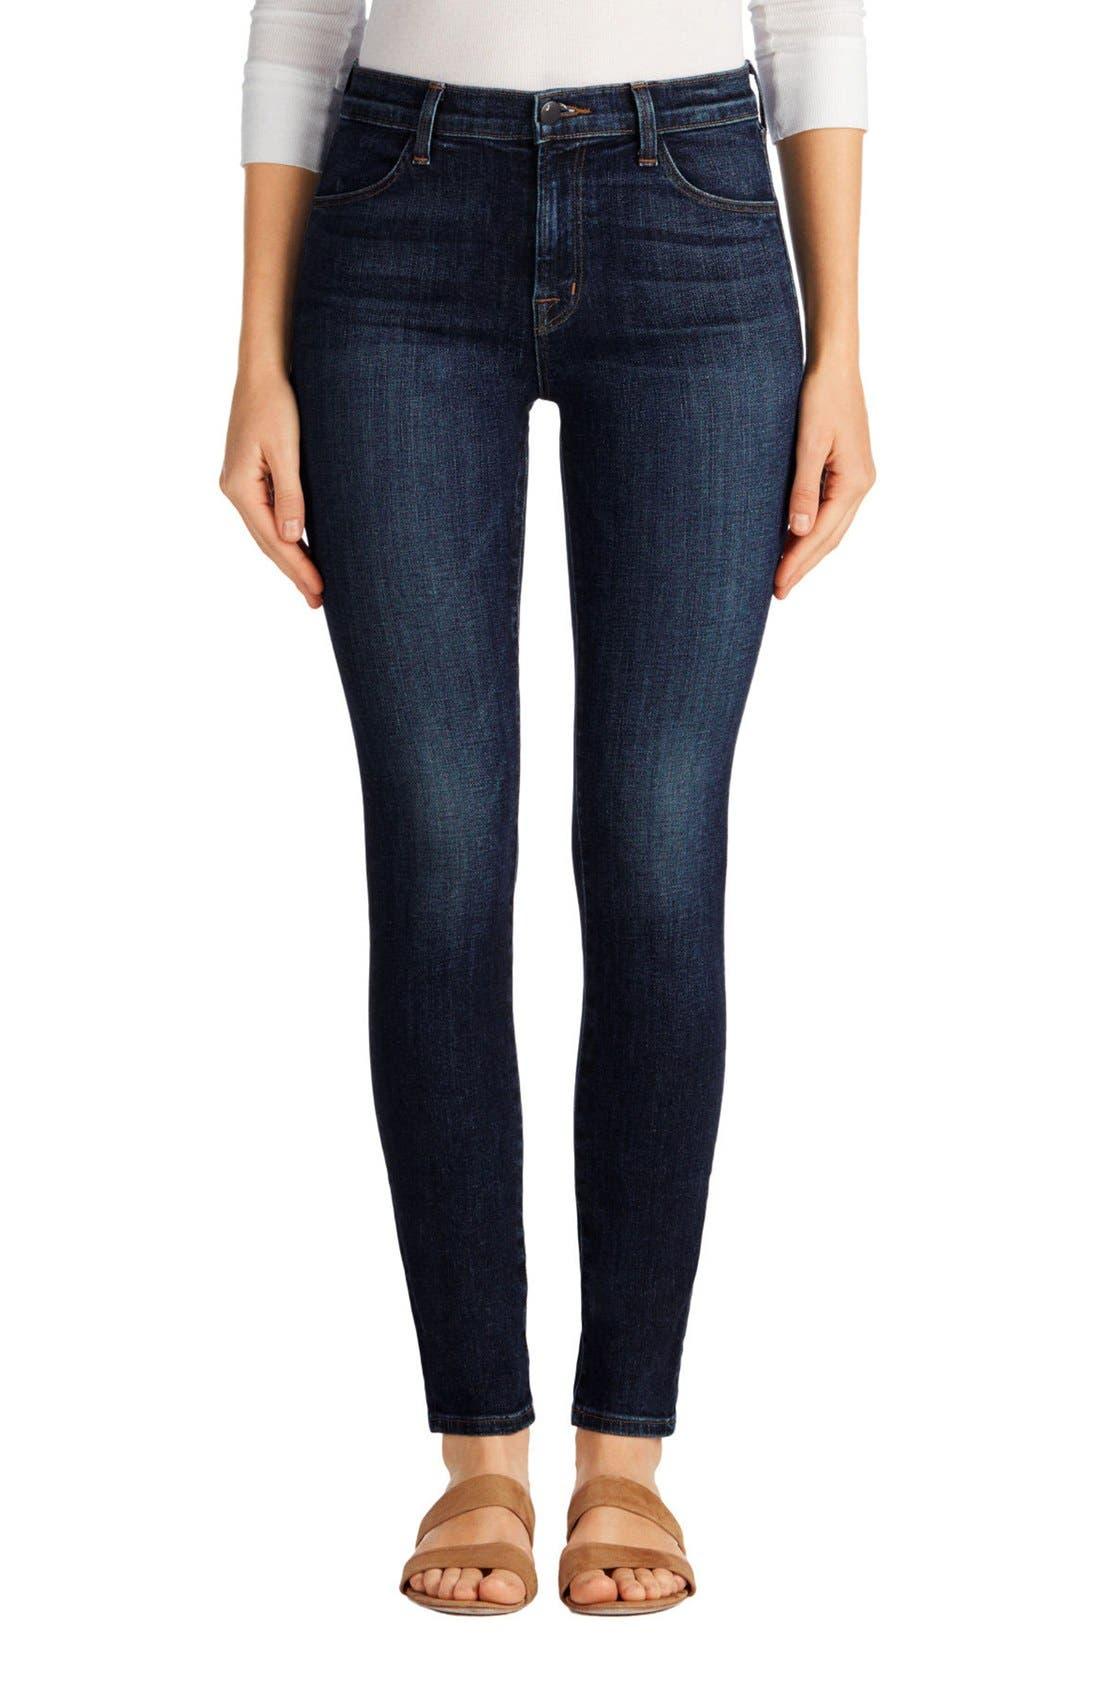 Alternate Image 1 Selected - J Brand Maria High Waist Skinny Jeans